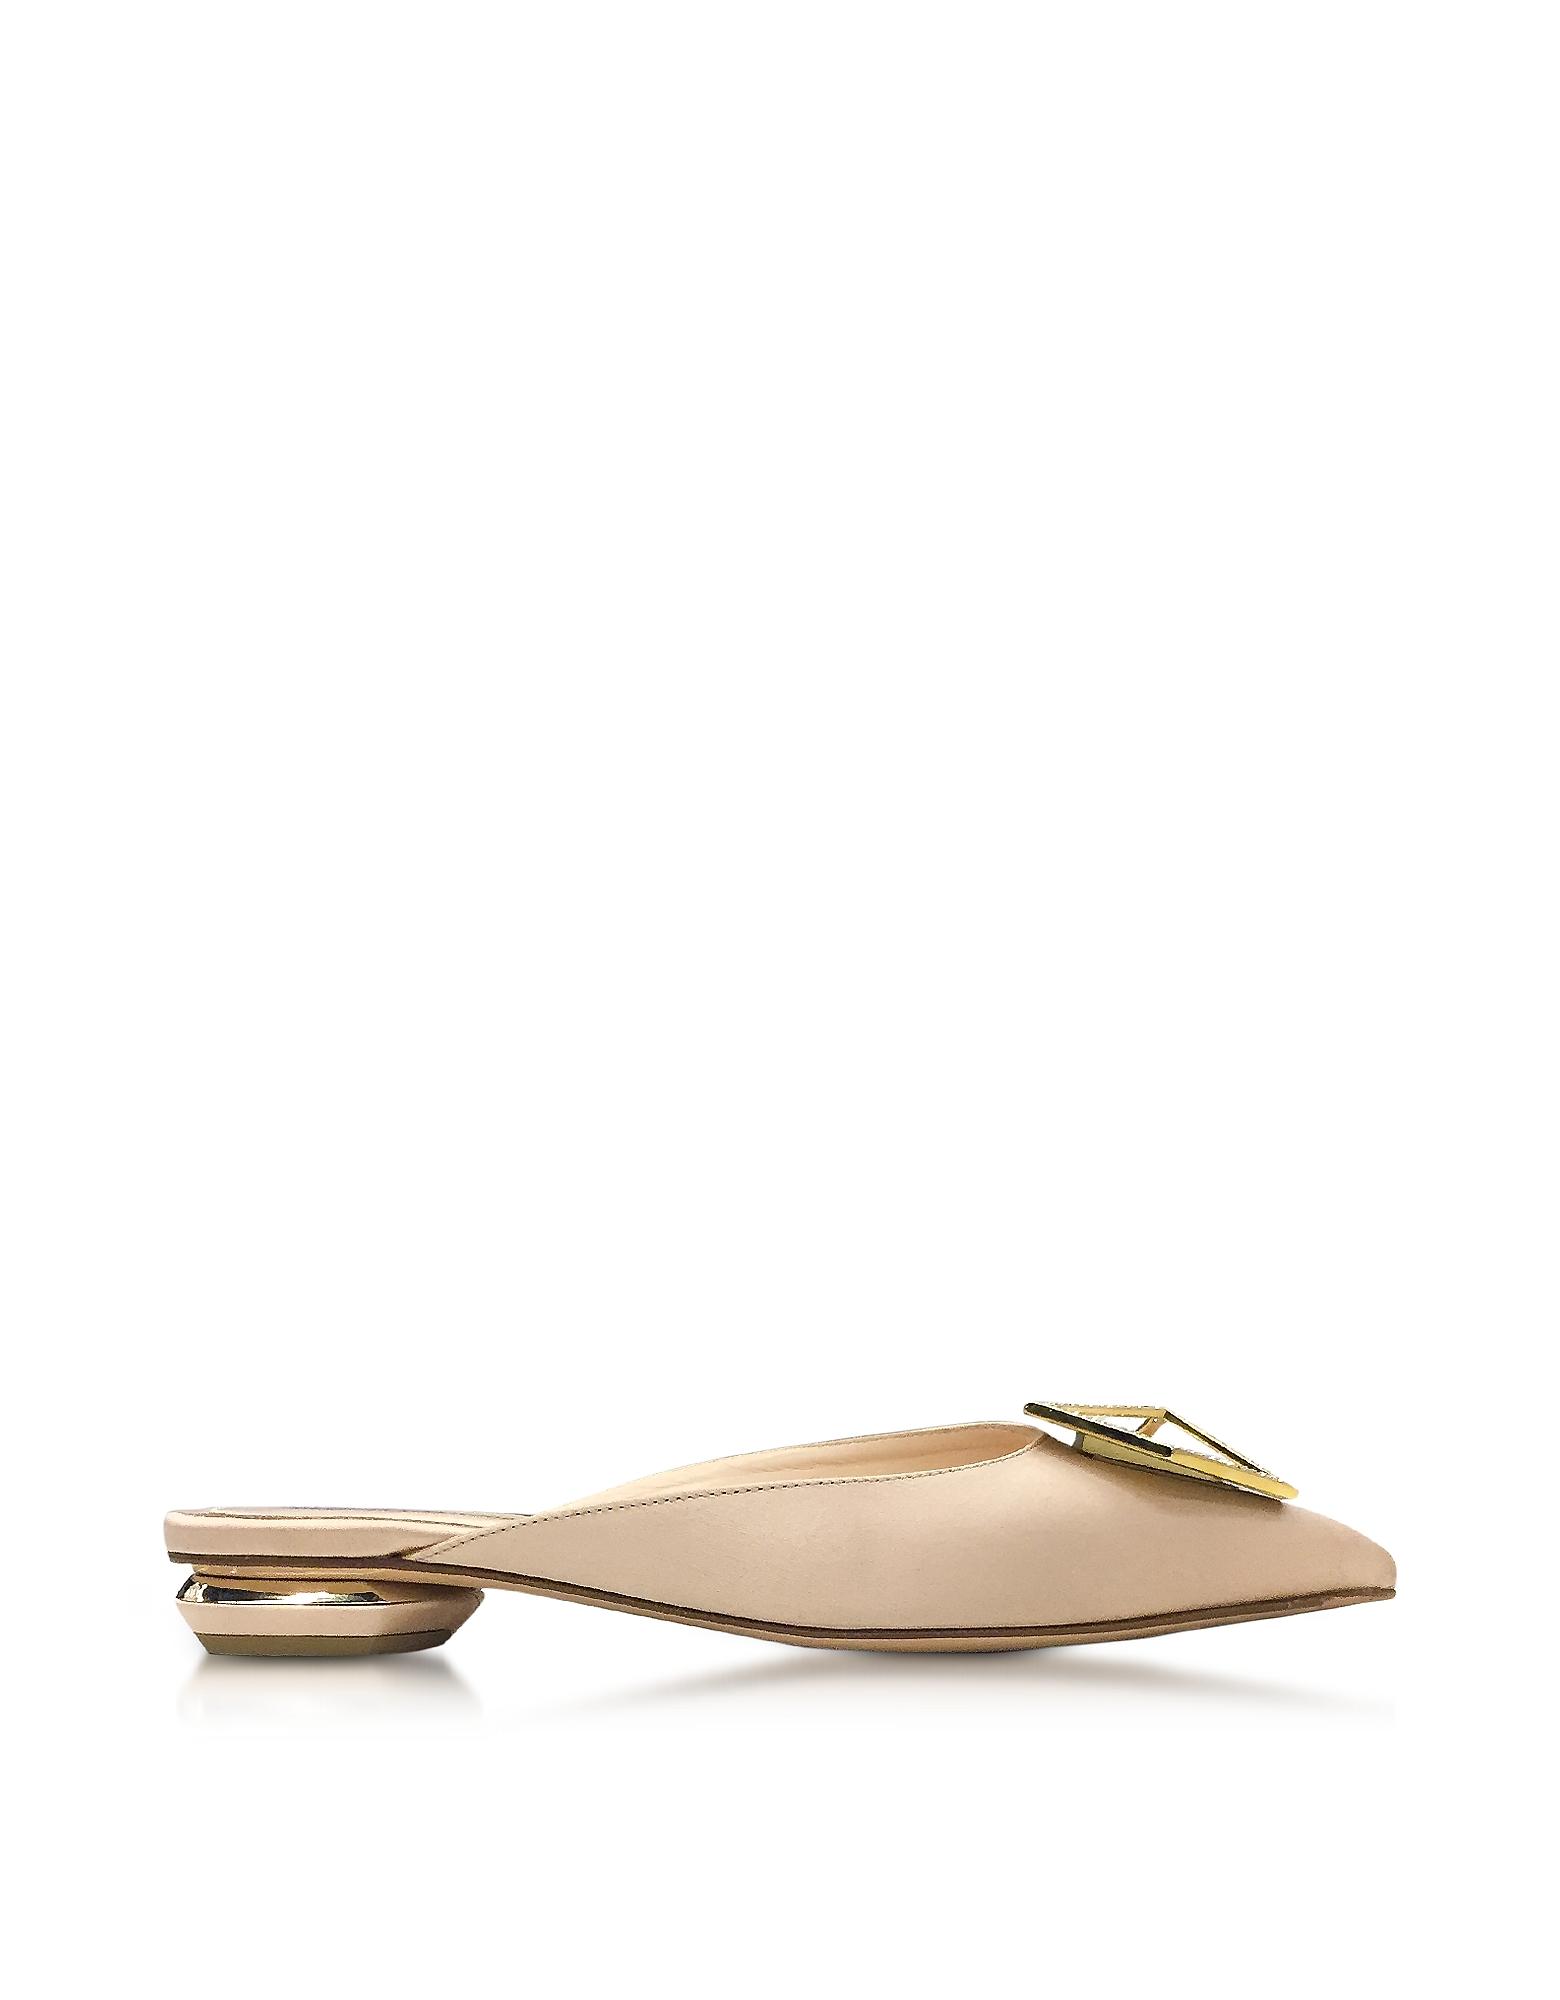 Nicholas Kirkwood Shoes, Eden Beige Satin Jewel Mule